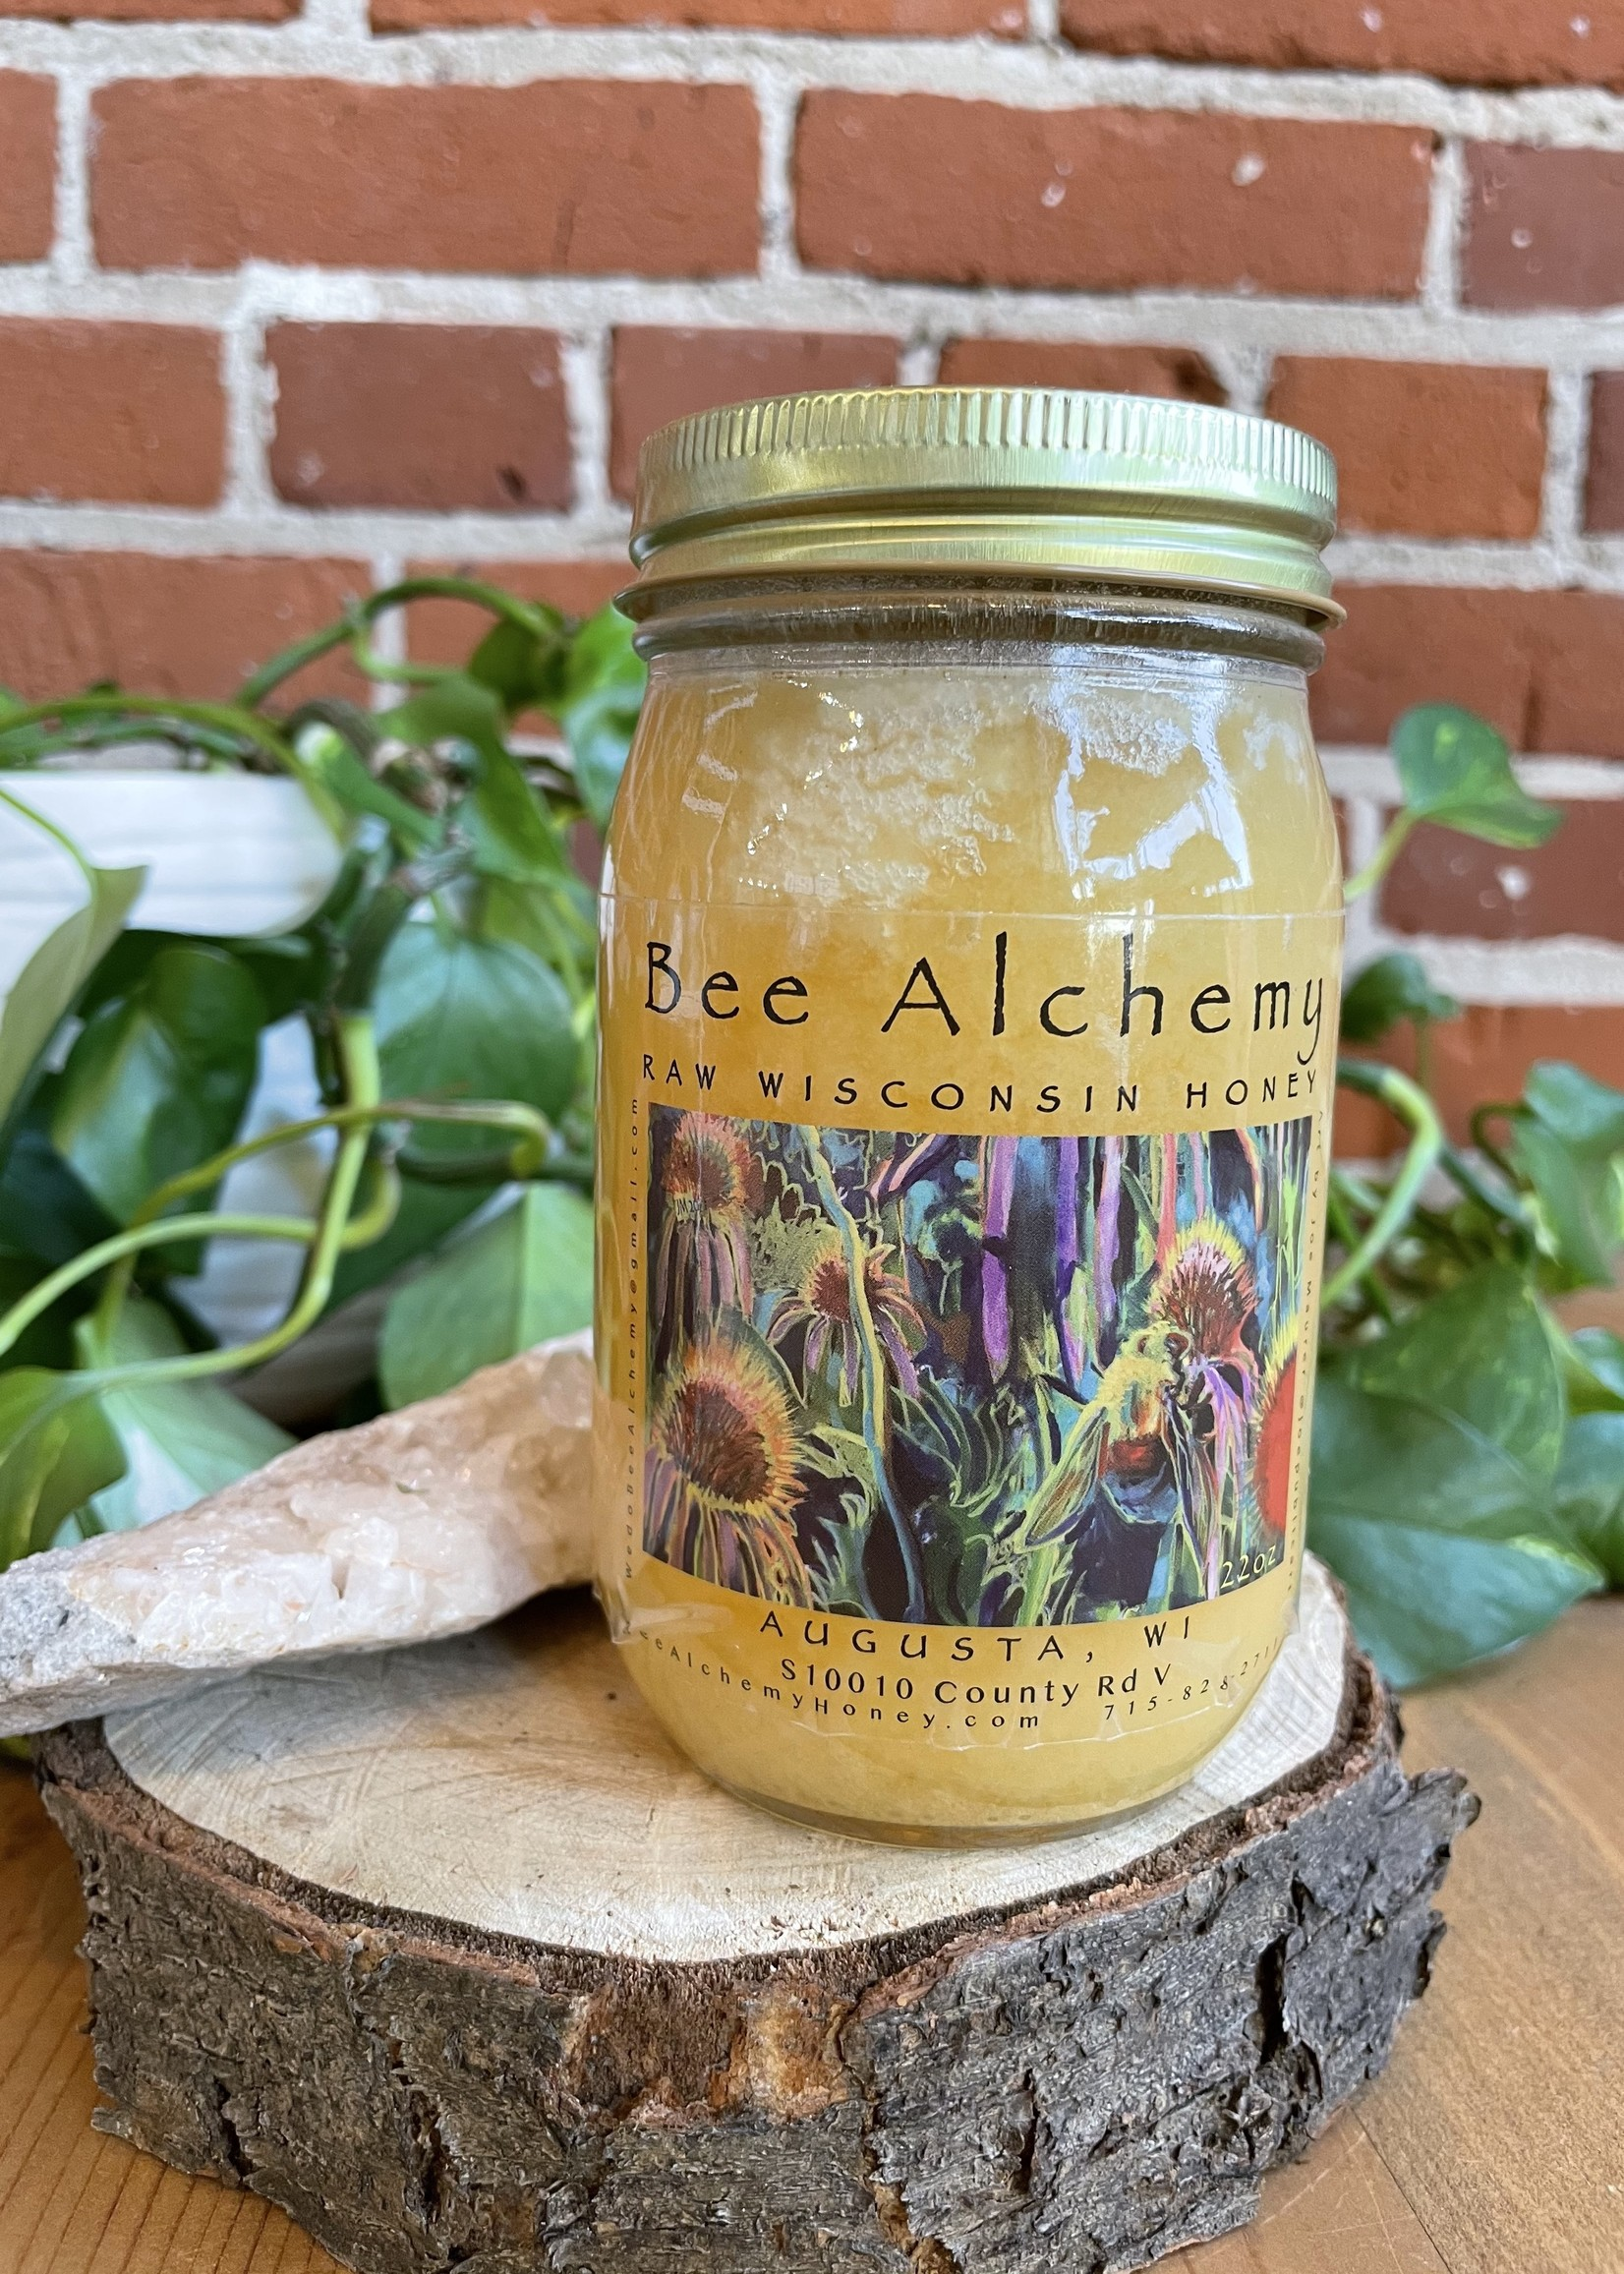 Bee Alchemy Honey